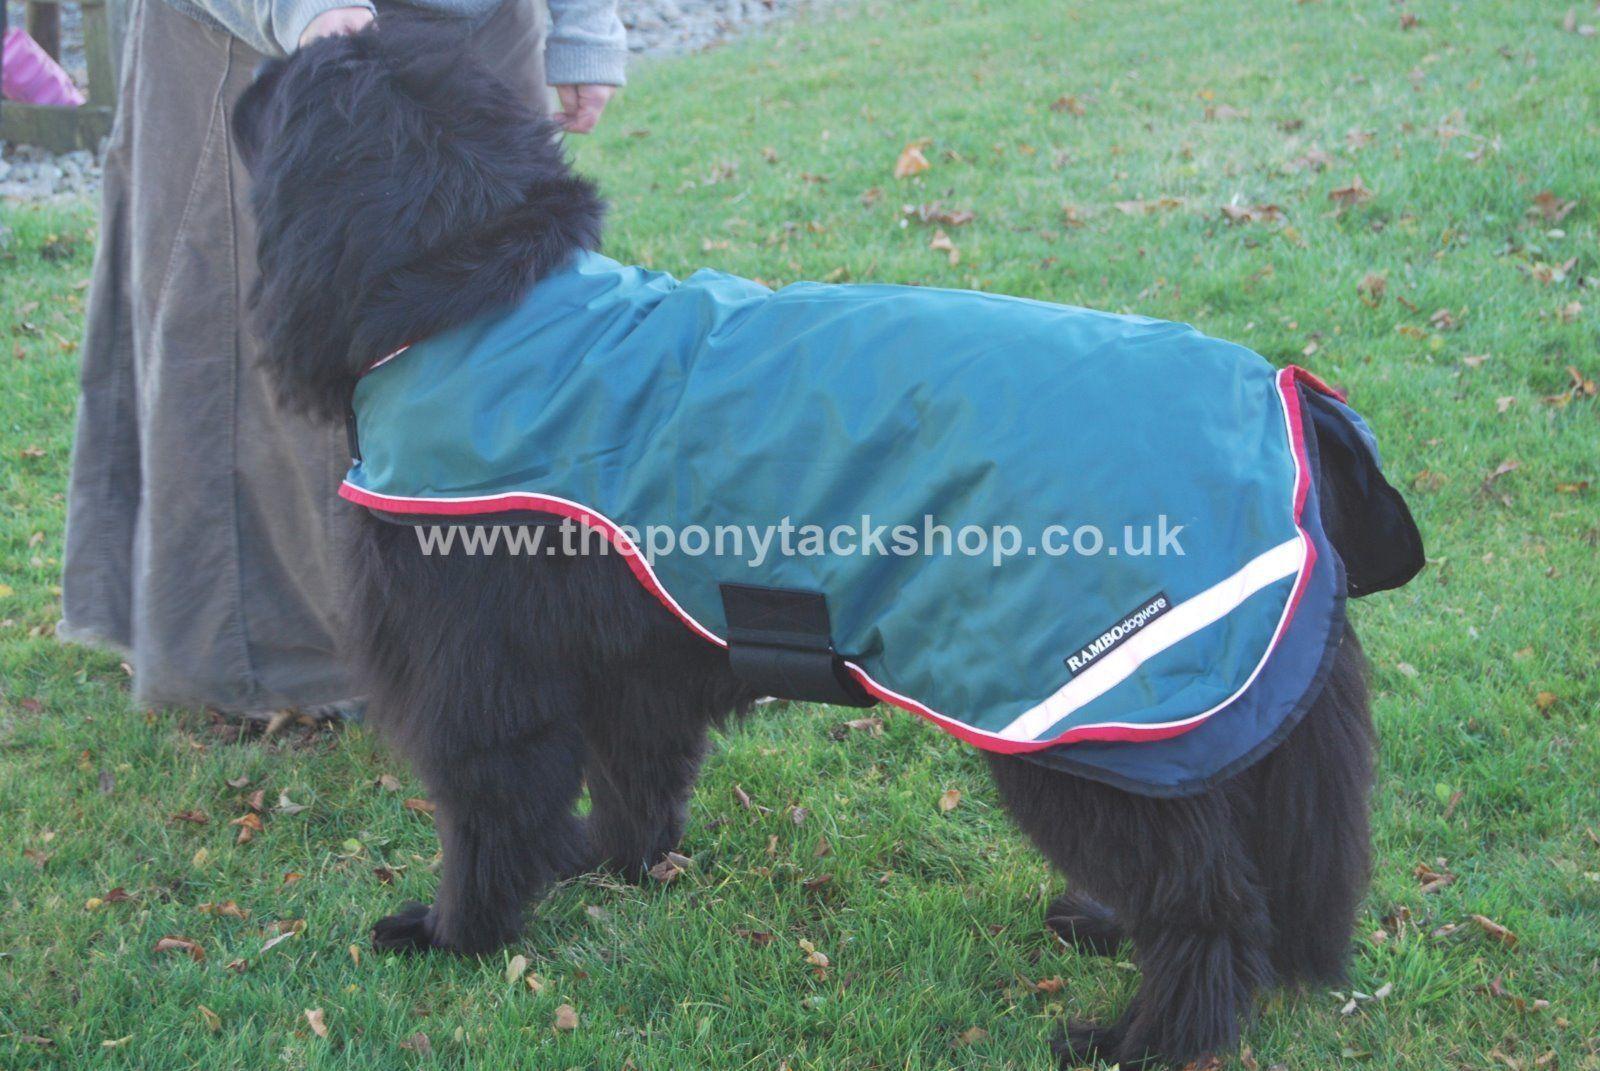 Horseware Rambo Waterproof Dog Rug - XXXL - St Bernard   Newfoundland etc